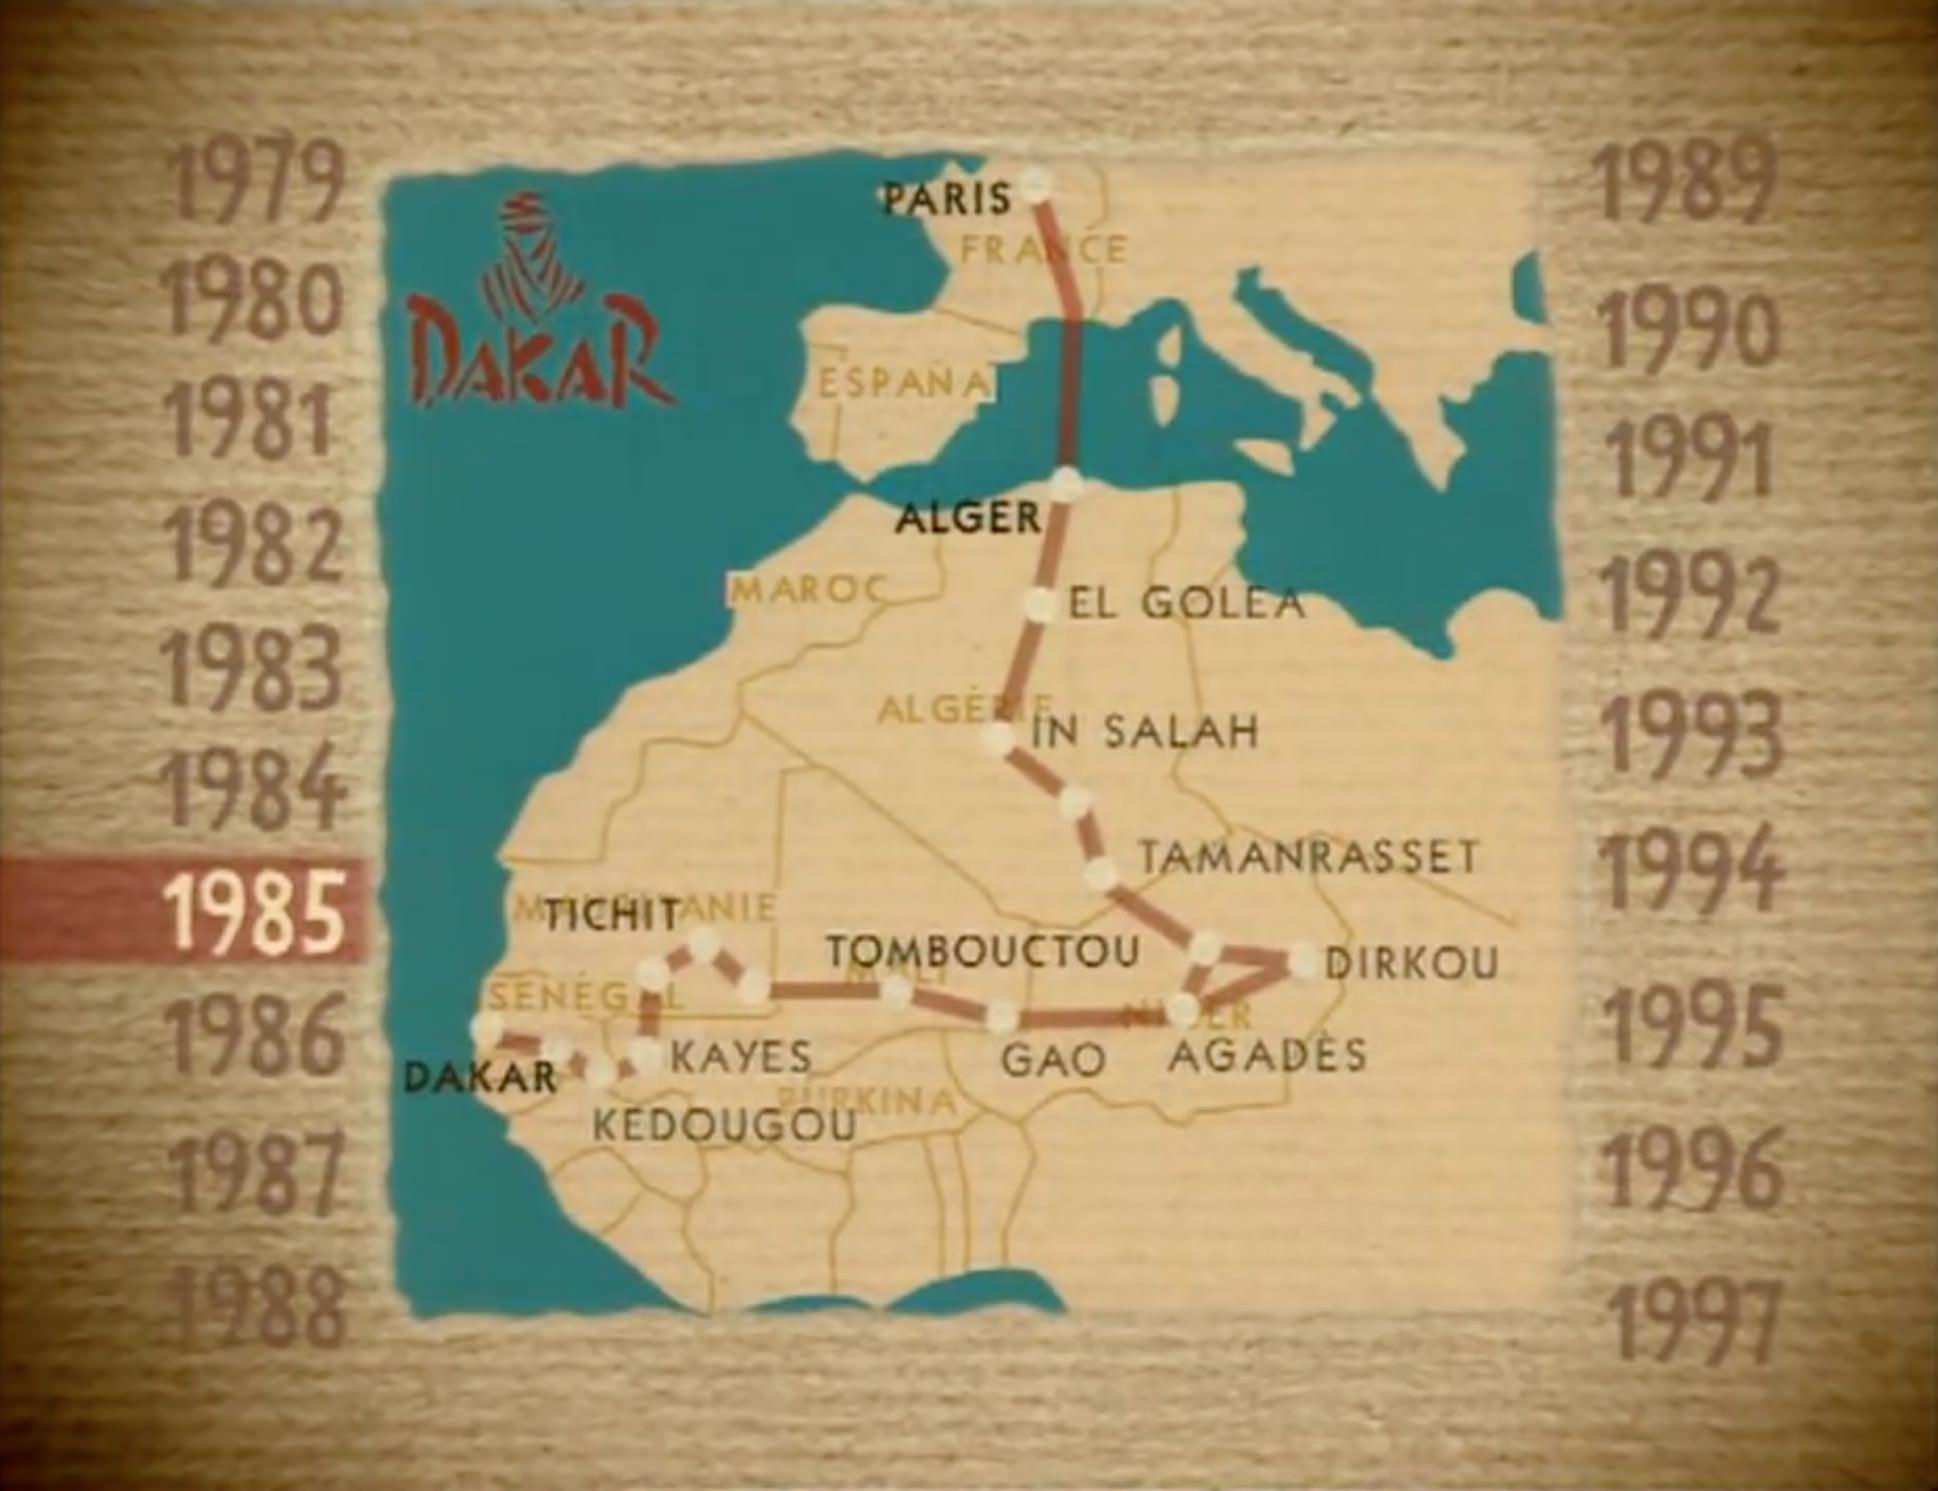 Doentary - The Paris - Dakar Rally: The Beginning - 1979 ... on paris-dakar route map, rally usa map, 2014 dakar rally raid map, rallye de dakar map, dakar world maps, dakar on facebook, dakar africa, dakar map island, songhai tribes map,